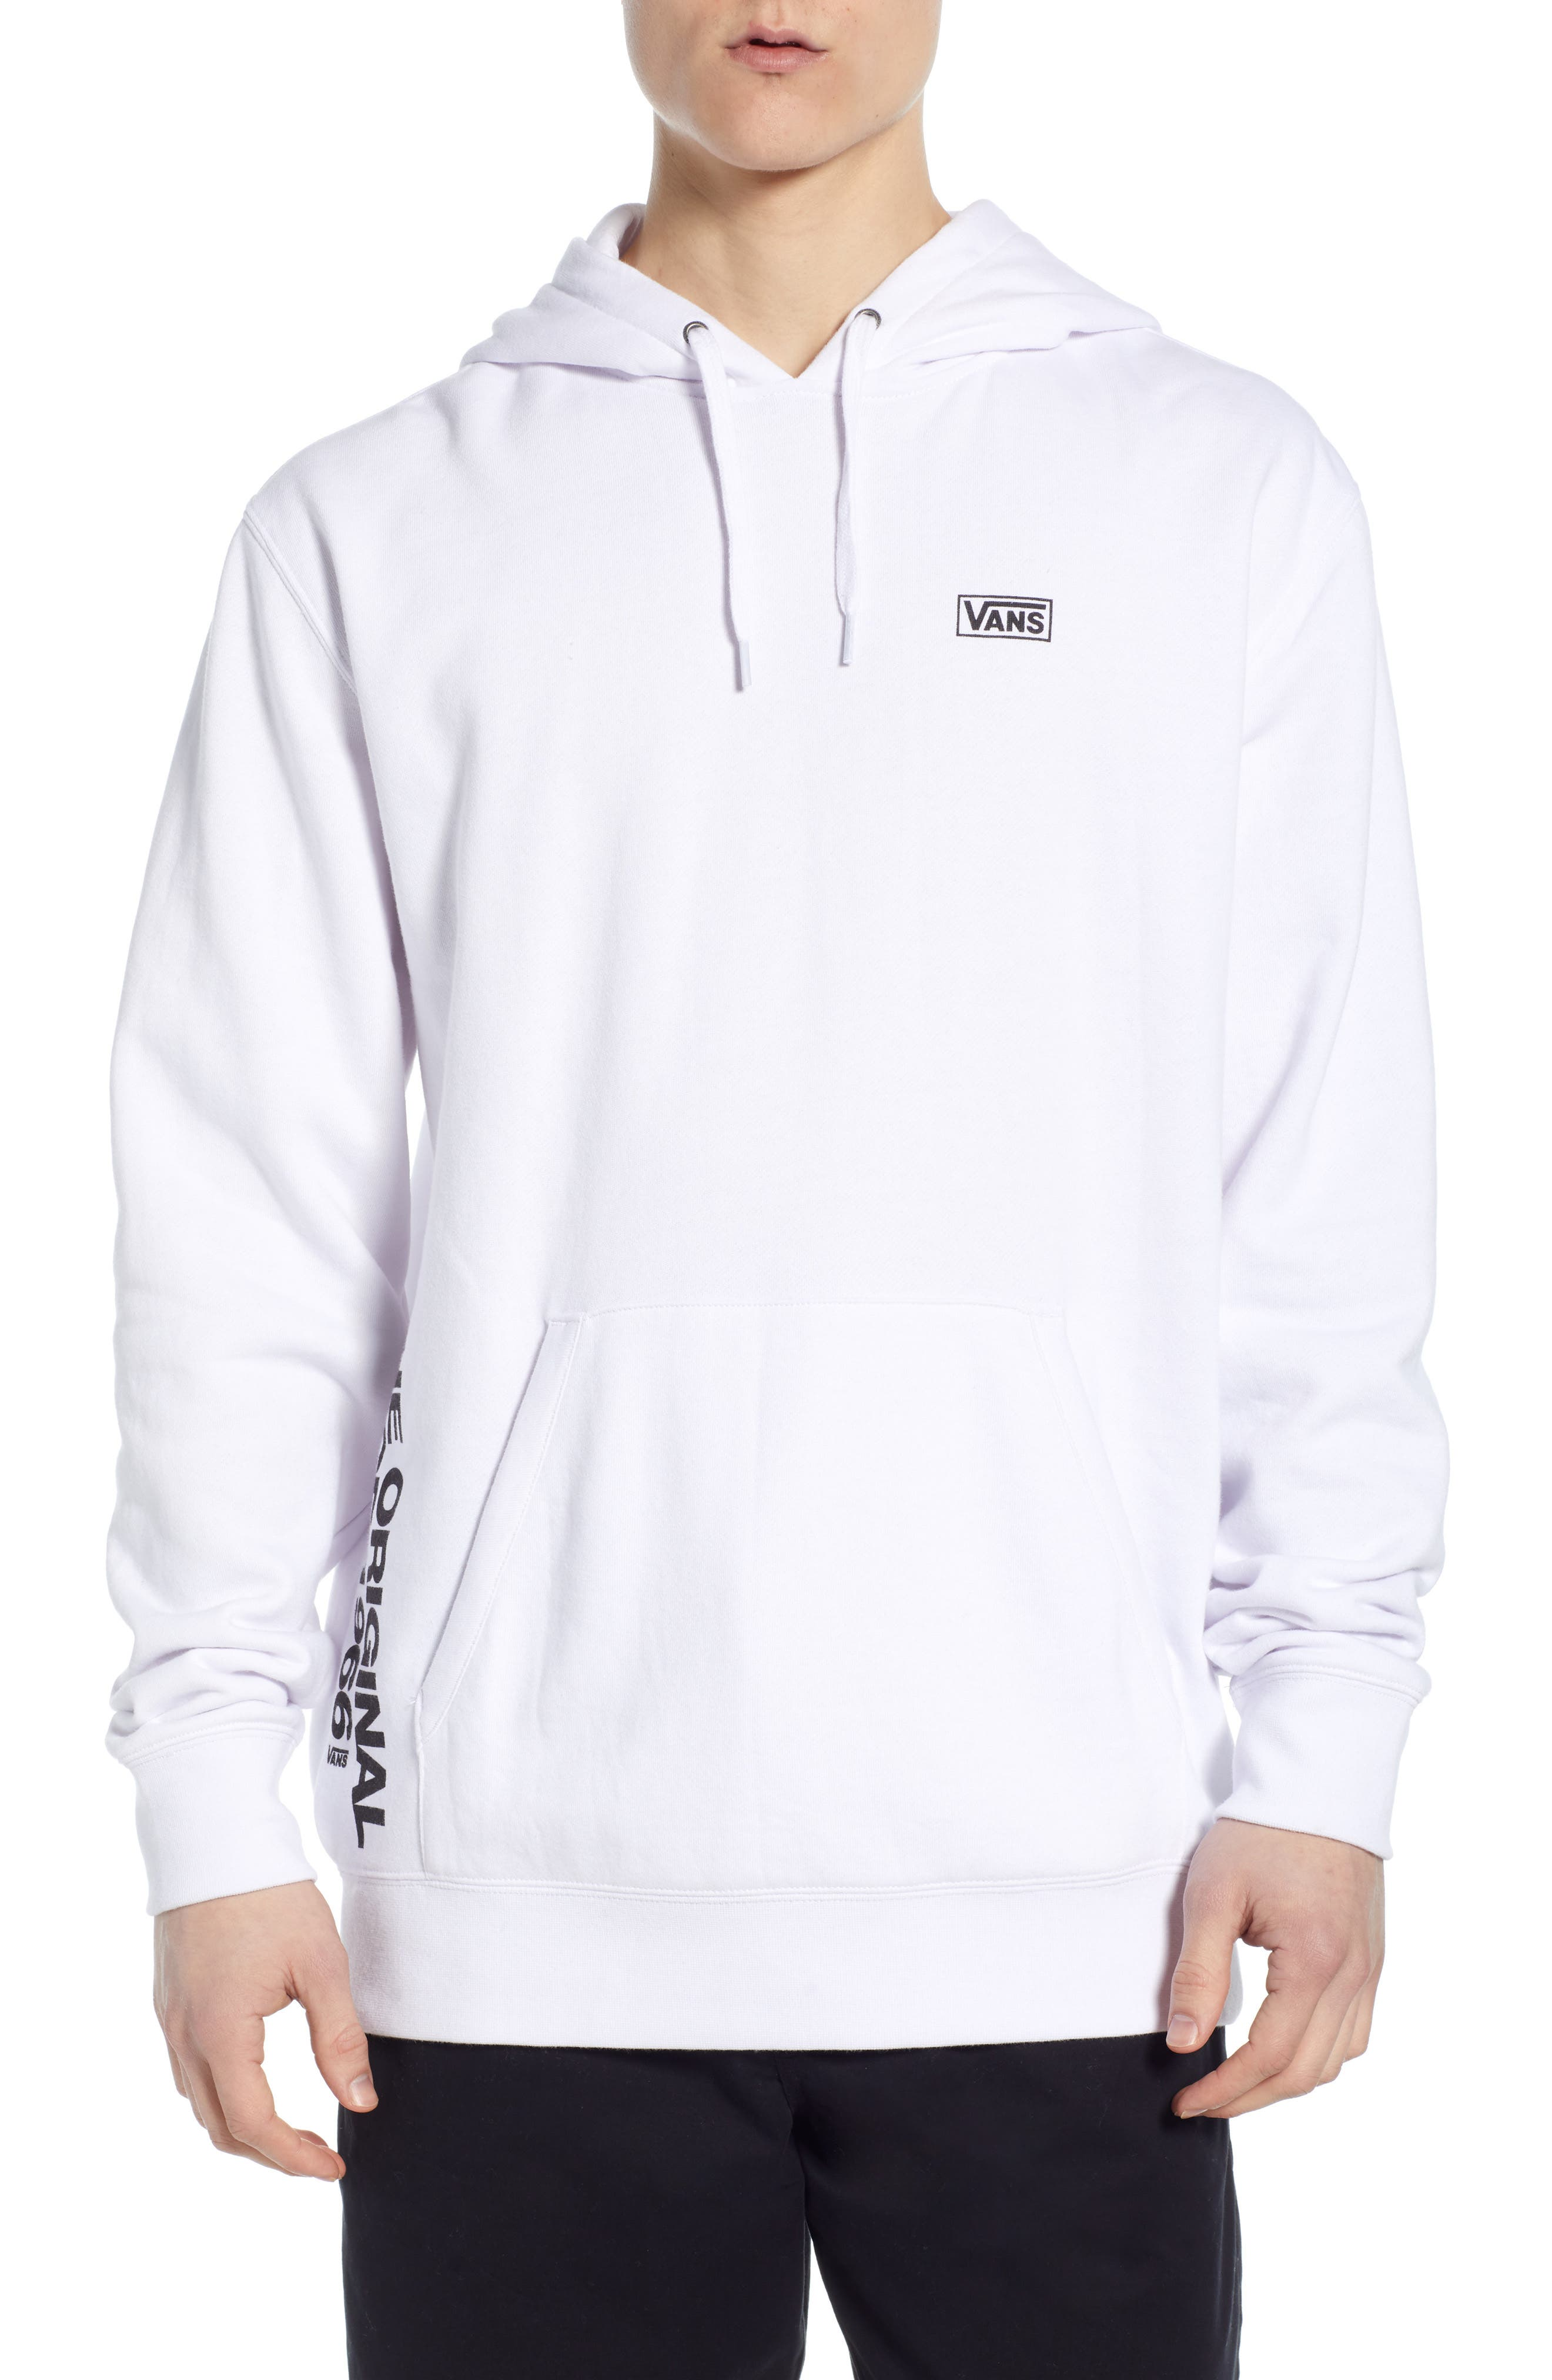 VANS, Off the Wall Distort Hooded Sweatshirt, Main thumbnail 1, color, WHITE